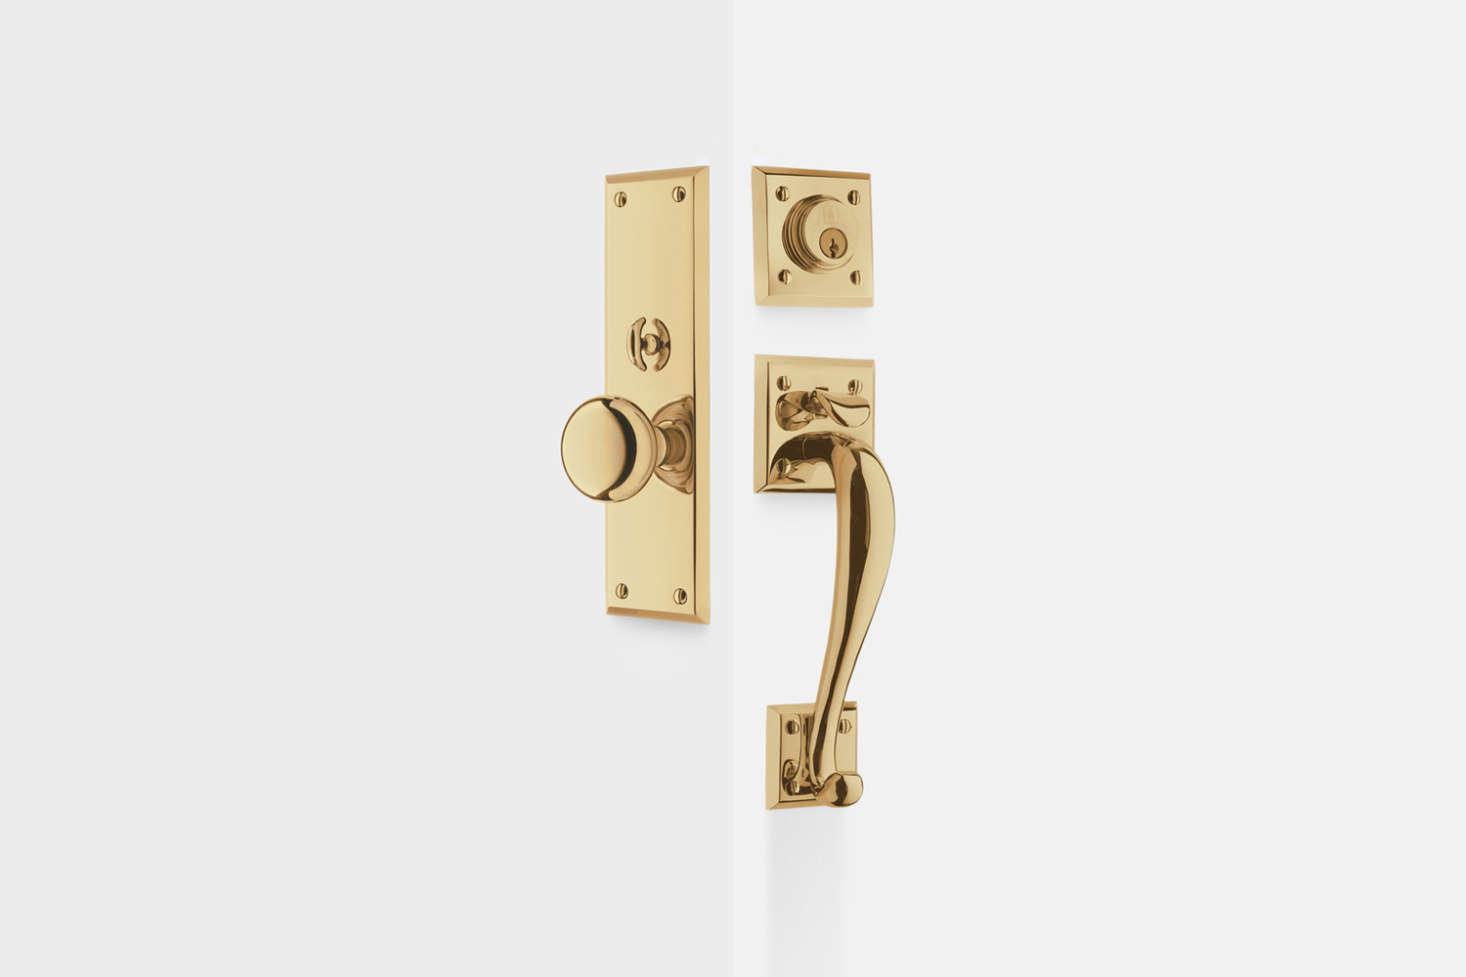 The Coleman Knob Exterior Door Mortoise Set in unlacquered brass is $699 atRejuvenation.